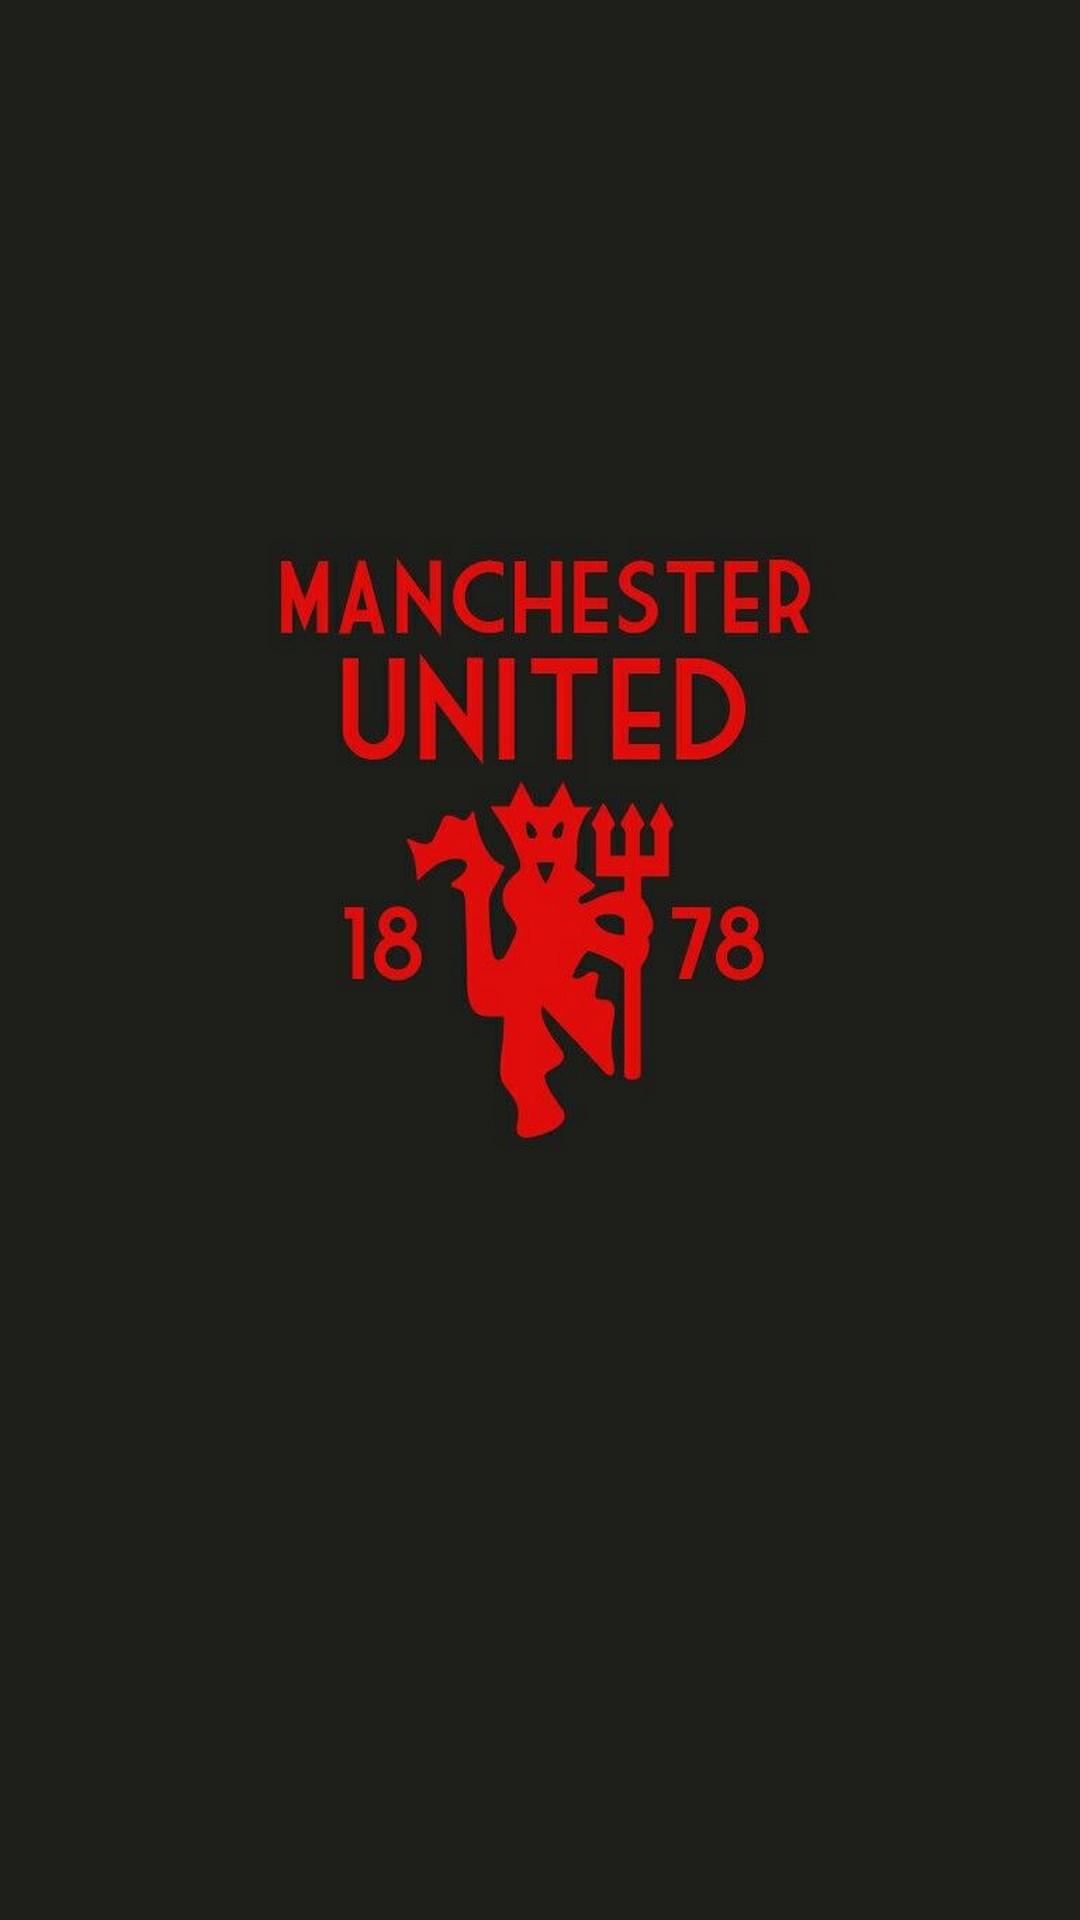 Manchester United Wallpaper 2019 Apk Download